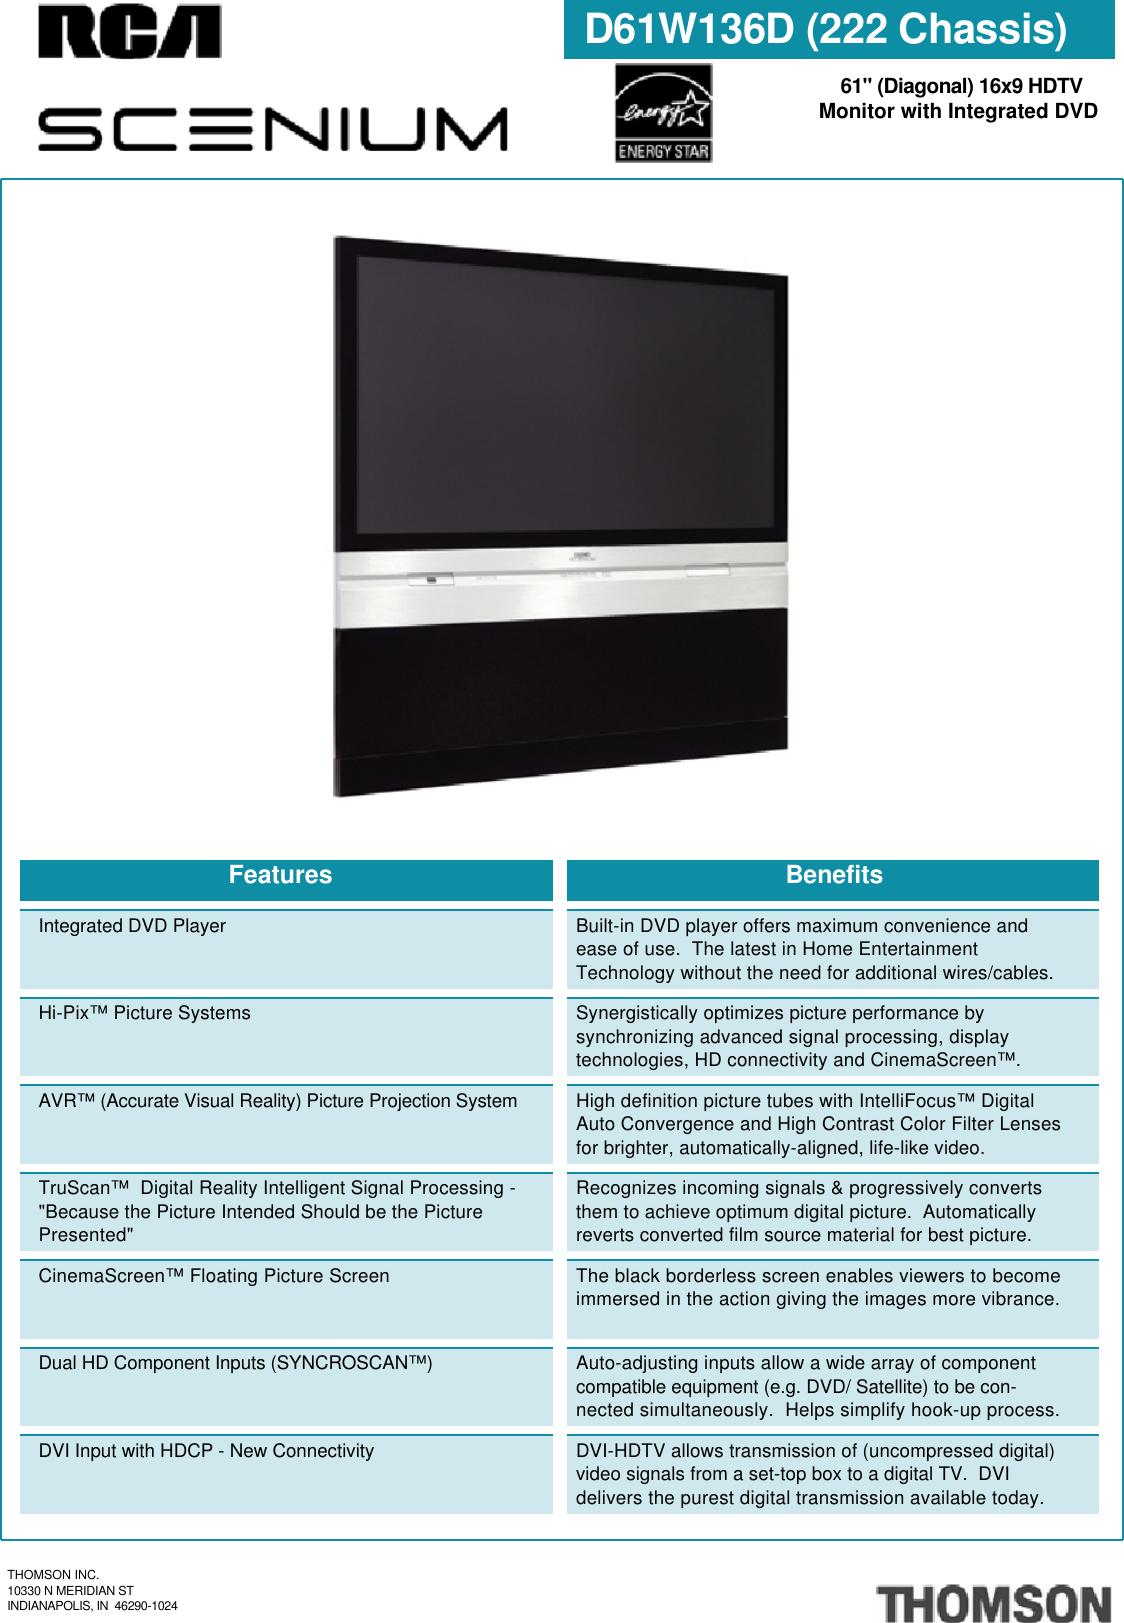 Rca Scenium D61W136D Users Manual